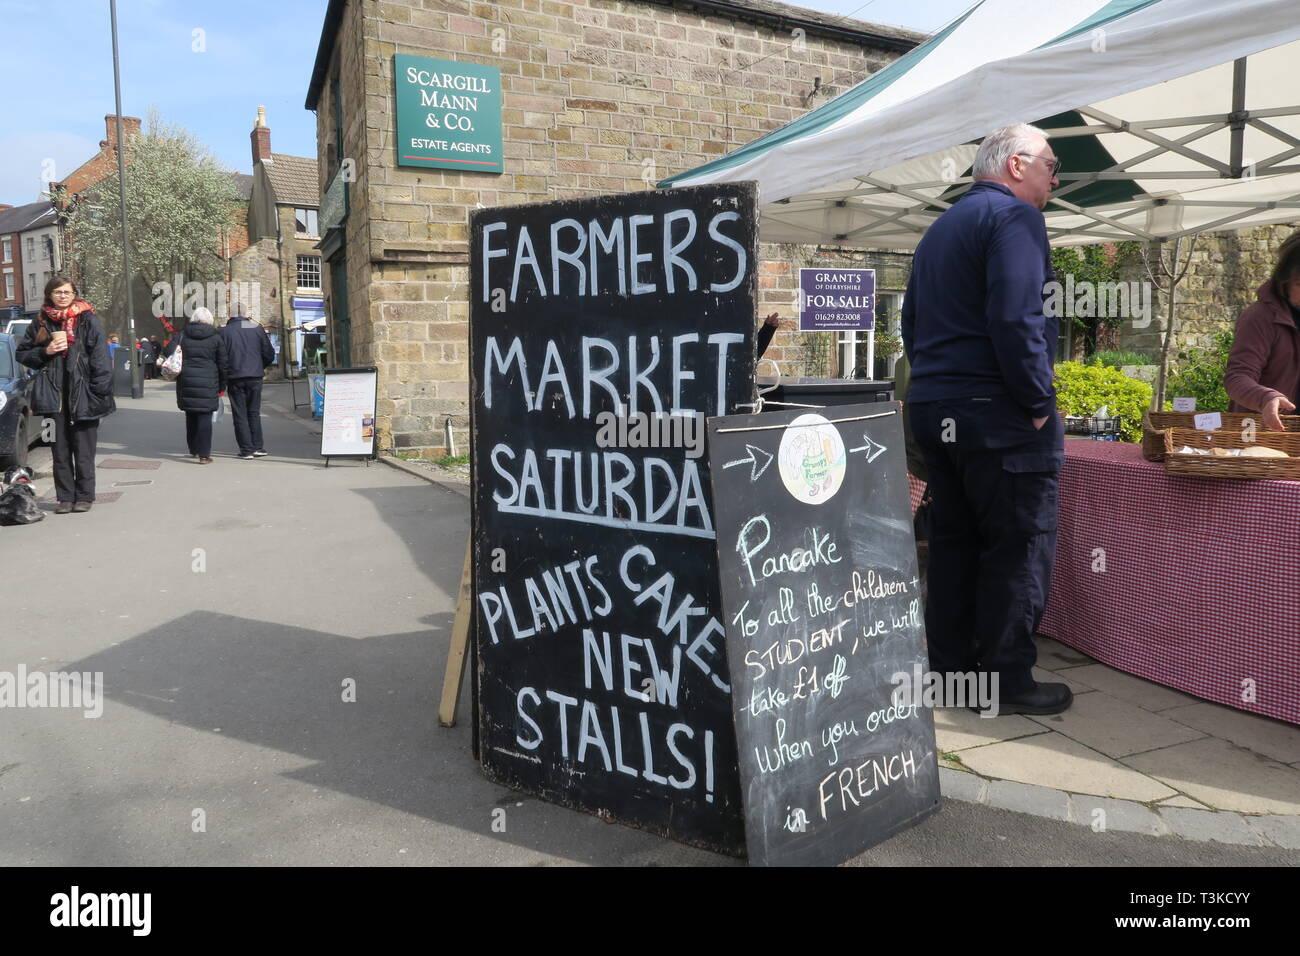 Wirksworth Farmer's Market, Debyshire - Stock Image